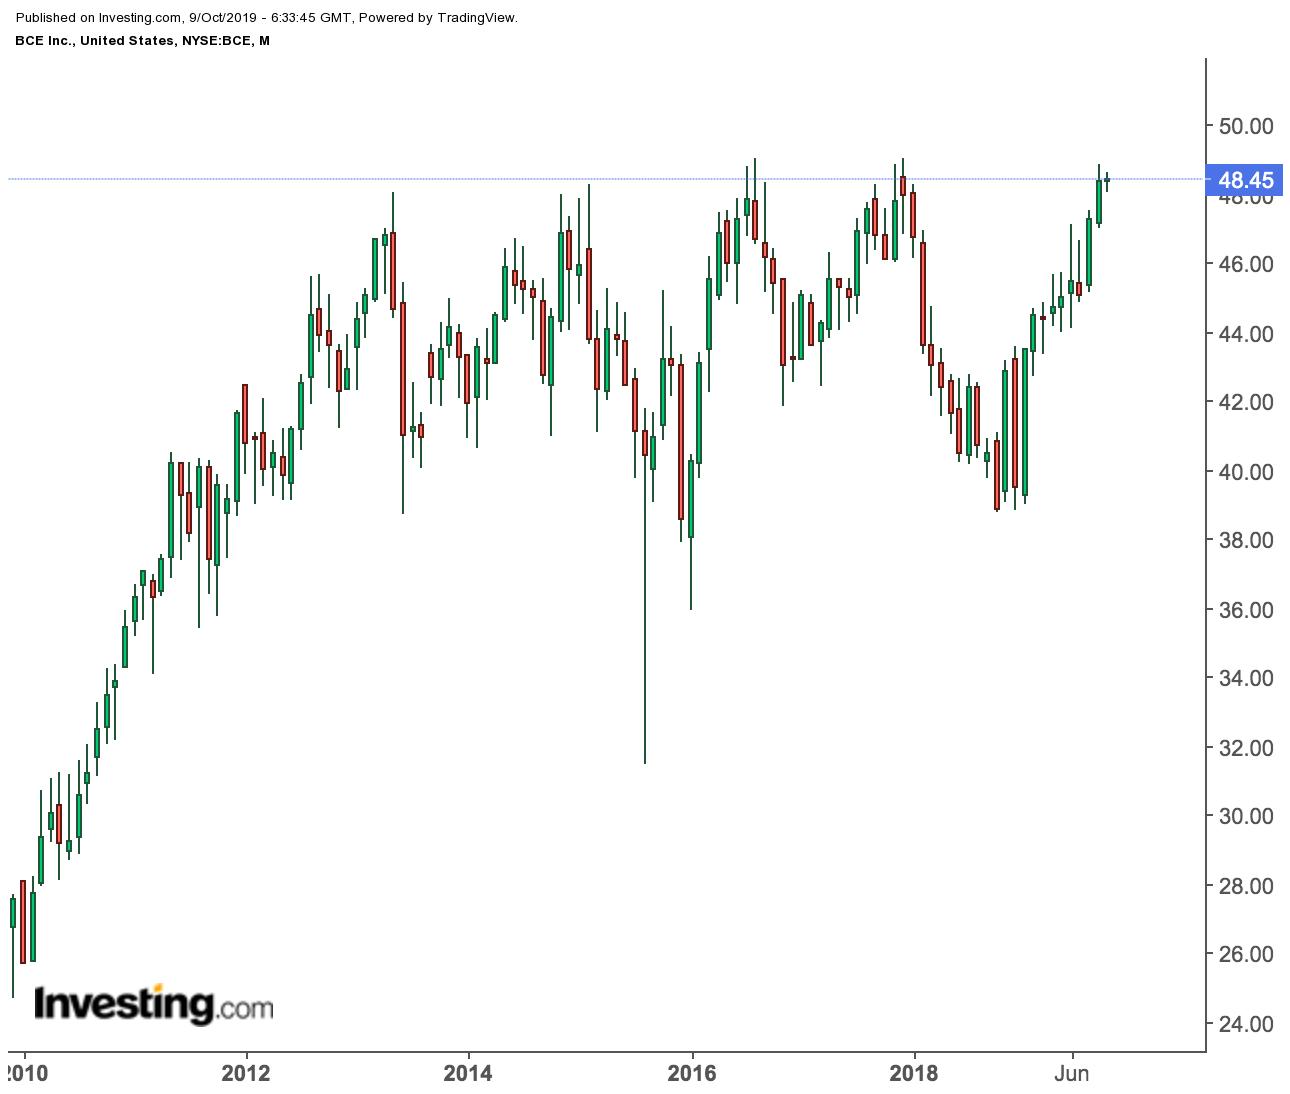 BCE Inc. price chart